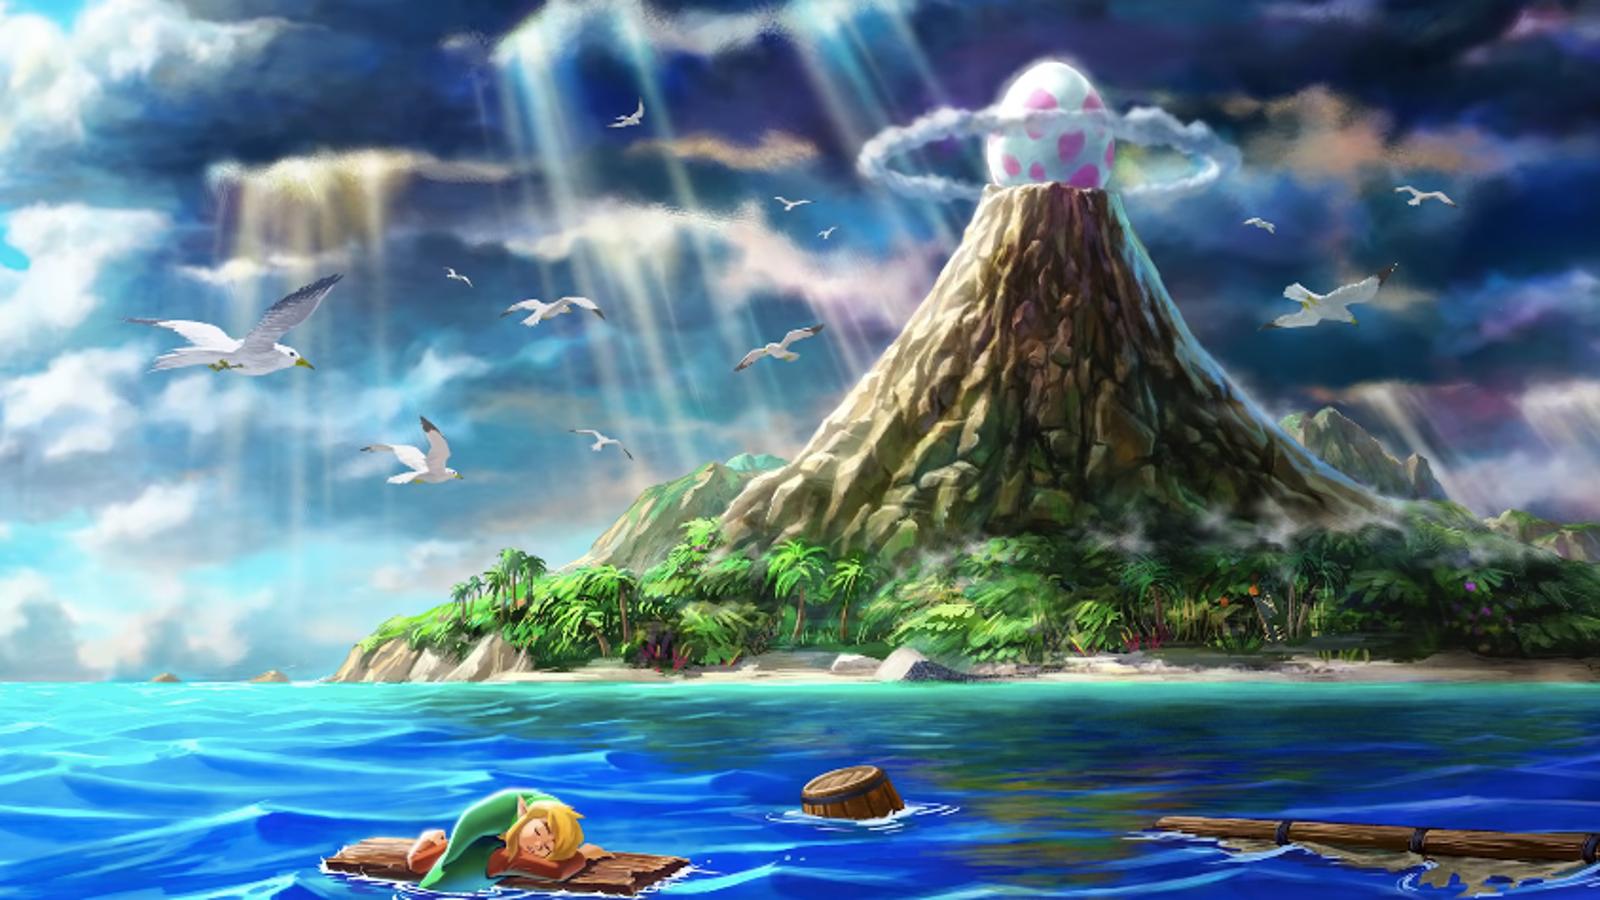 Tips For Playing The Legend of Zelda: Link's Awakening